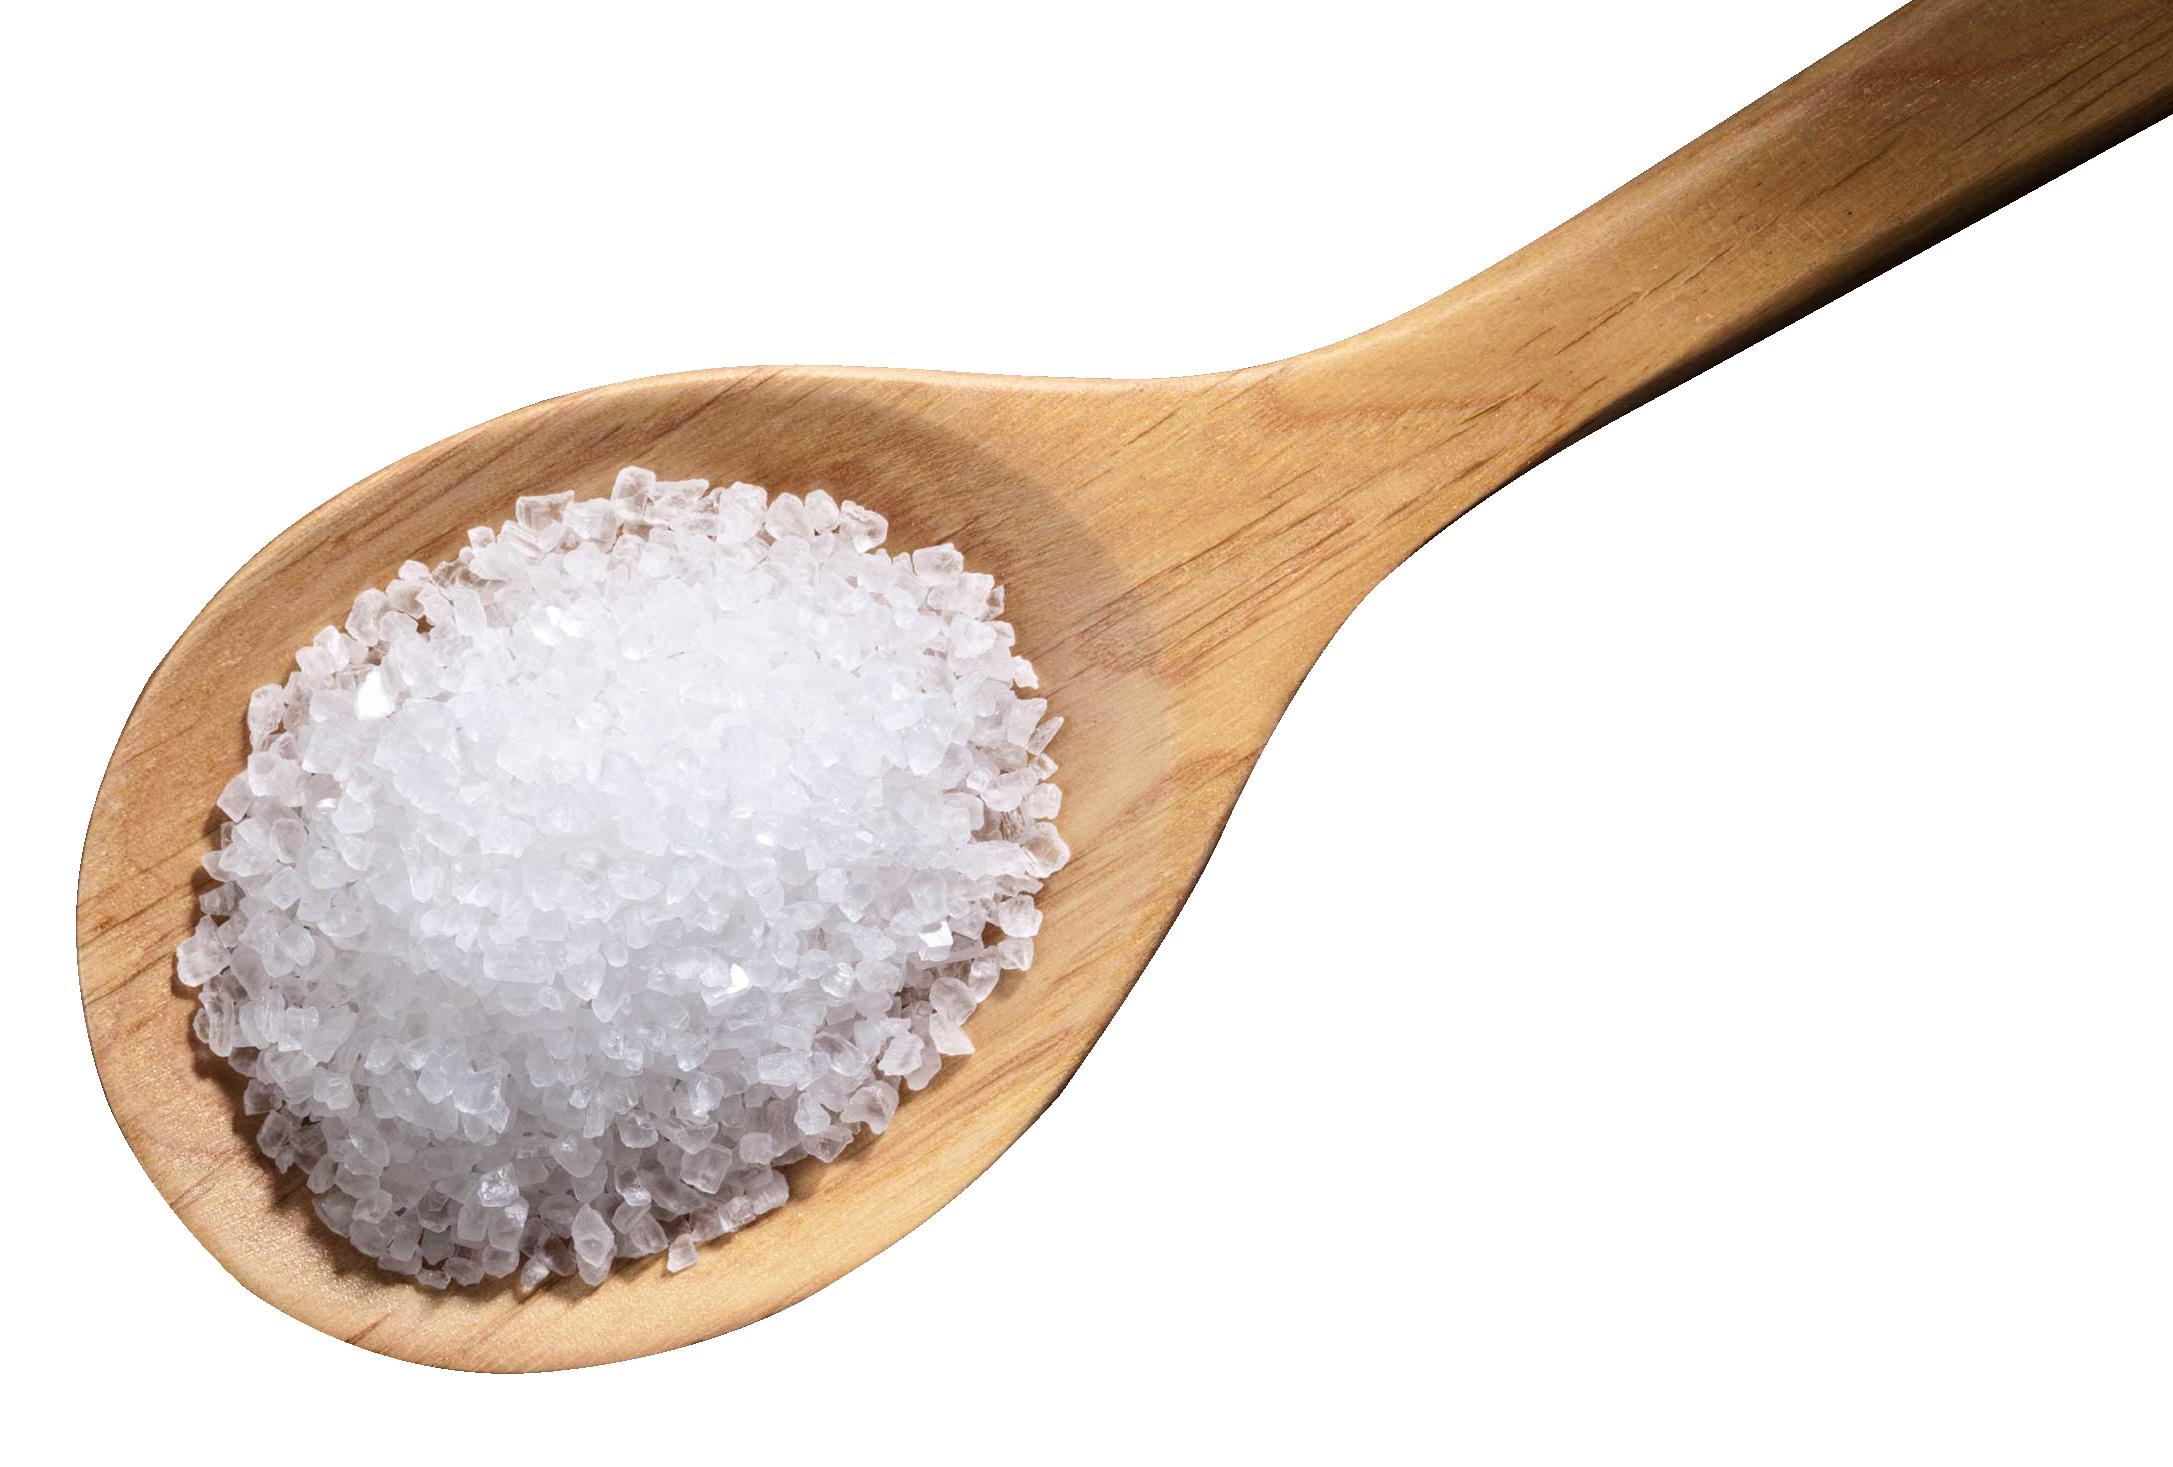 Crystal clipart salt crystal. Png image purepng free